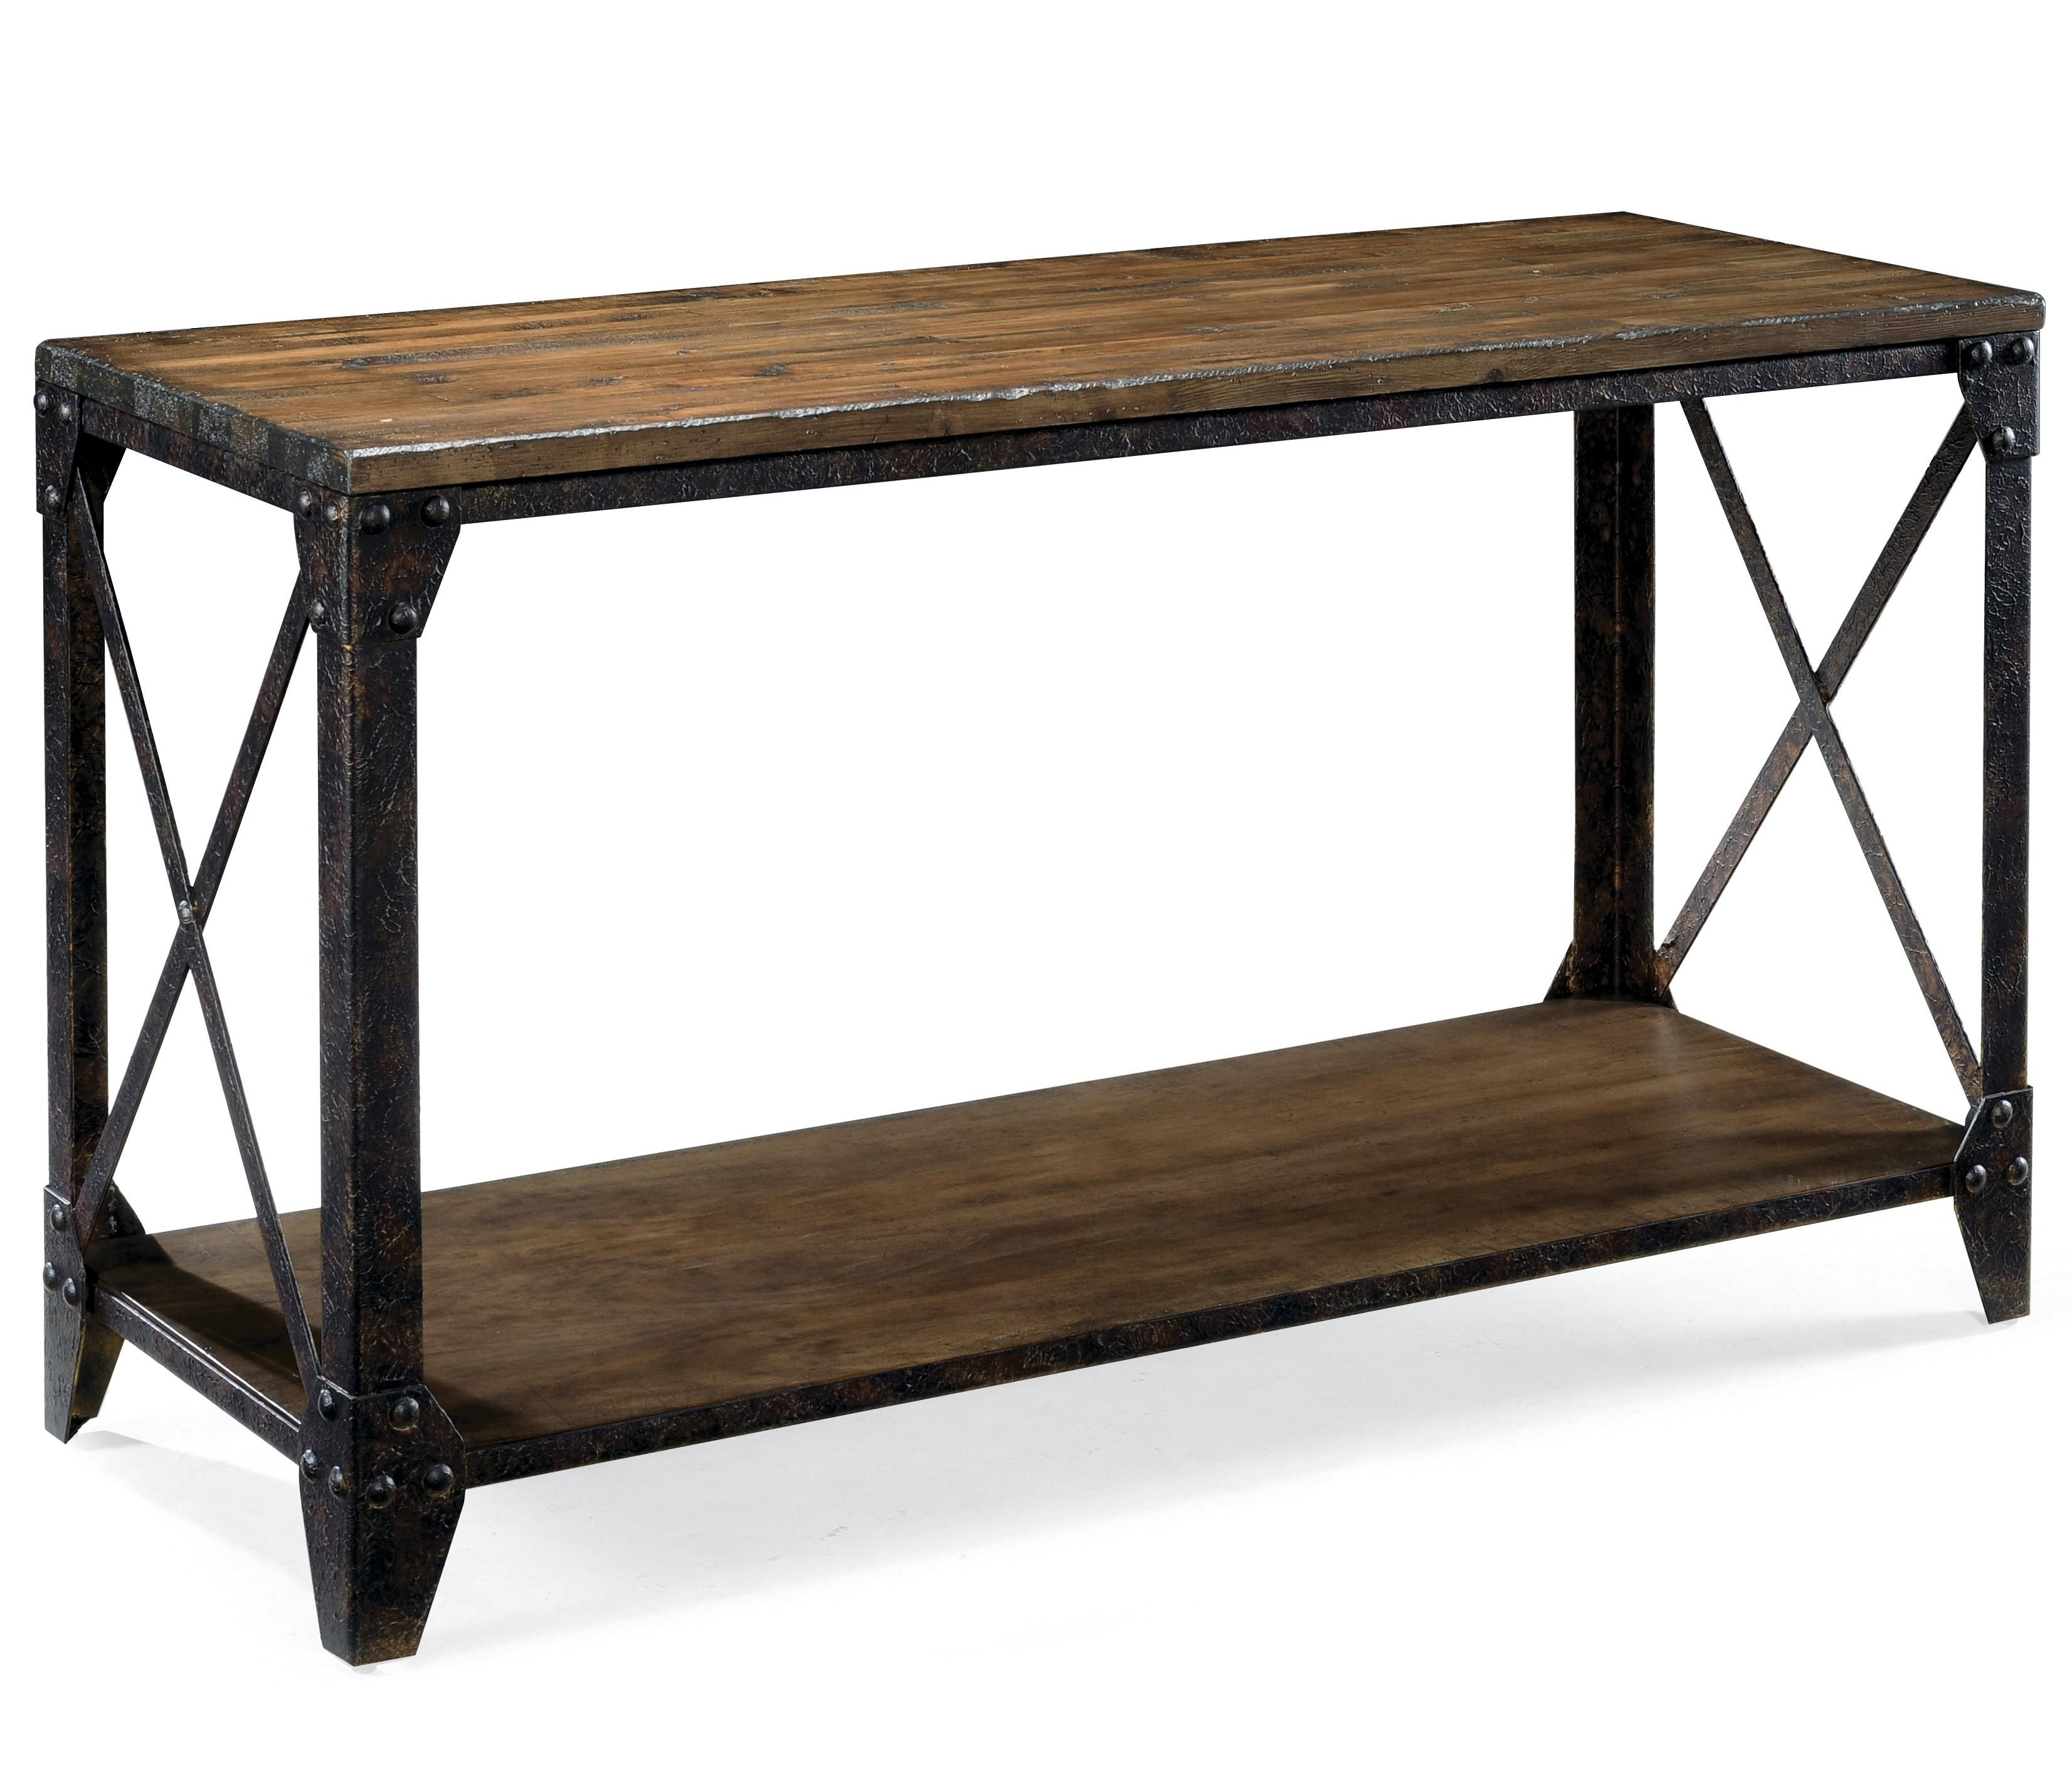 pinebrook rectangular sofa table with rustic iron legs by magnussen rh pinterest com